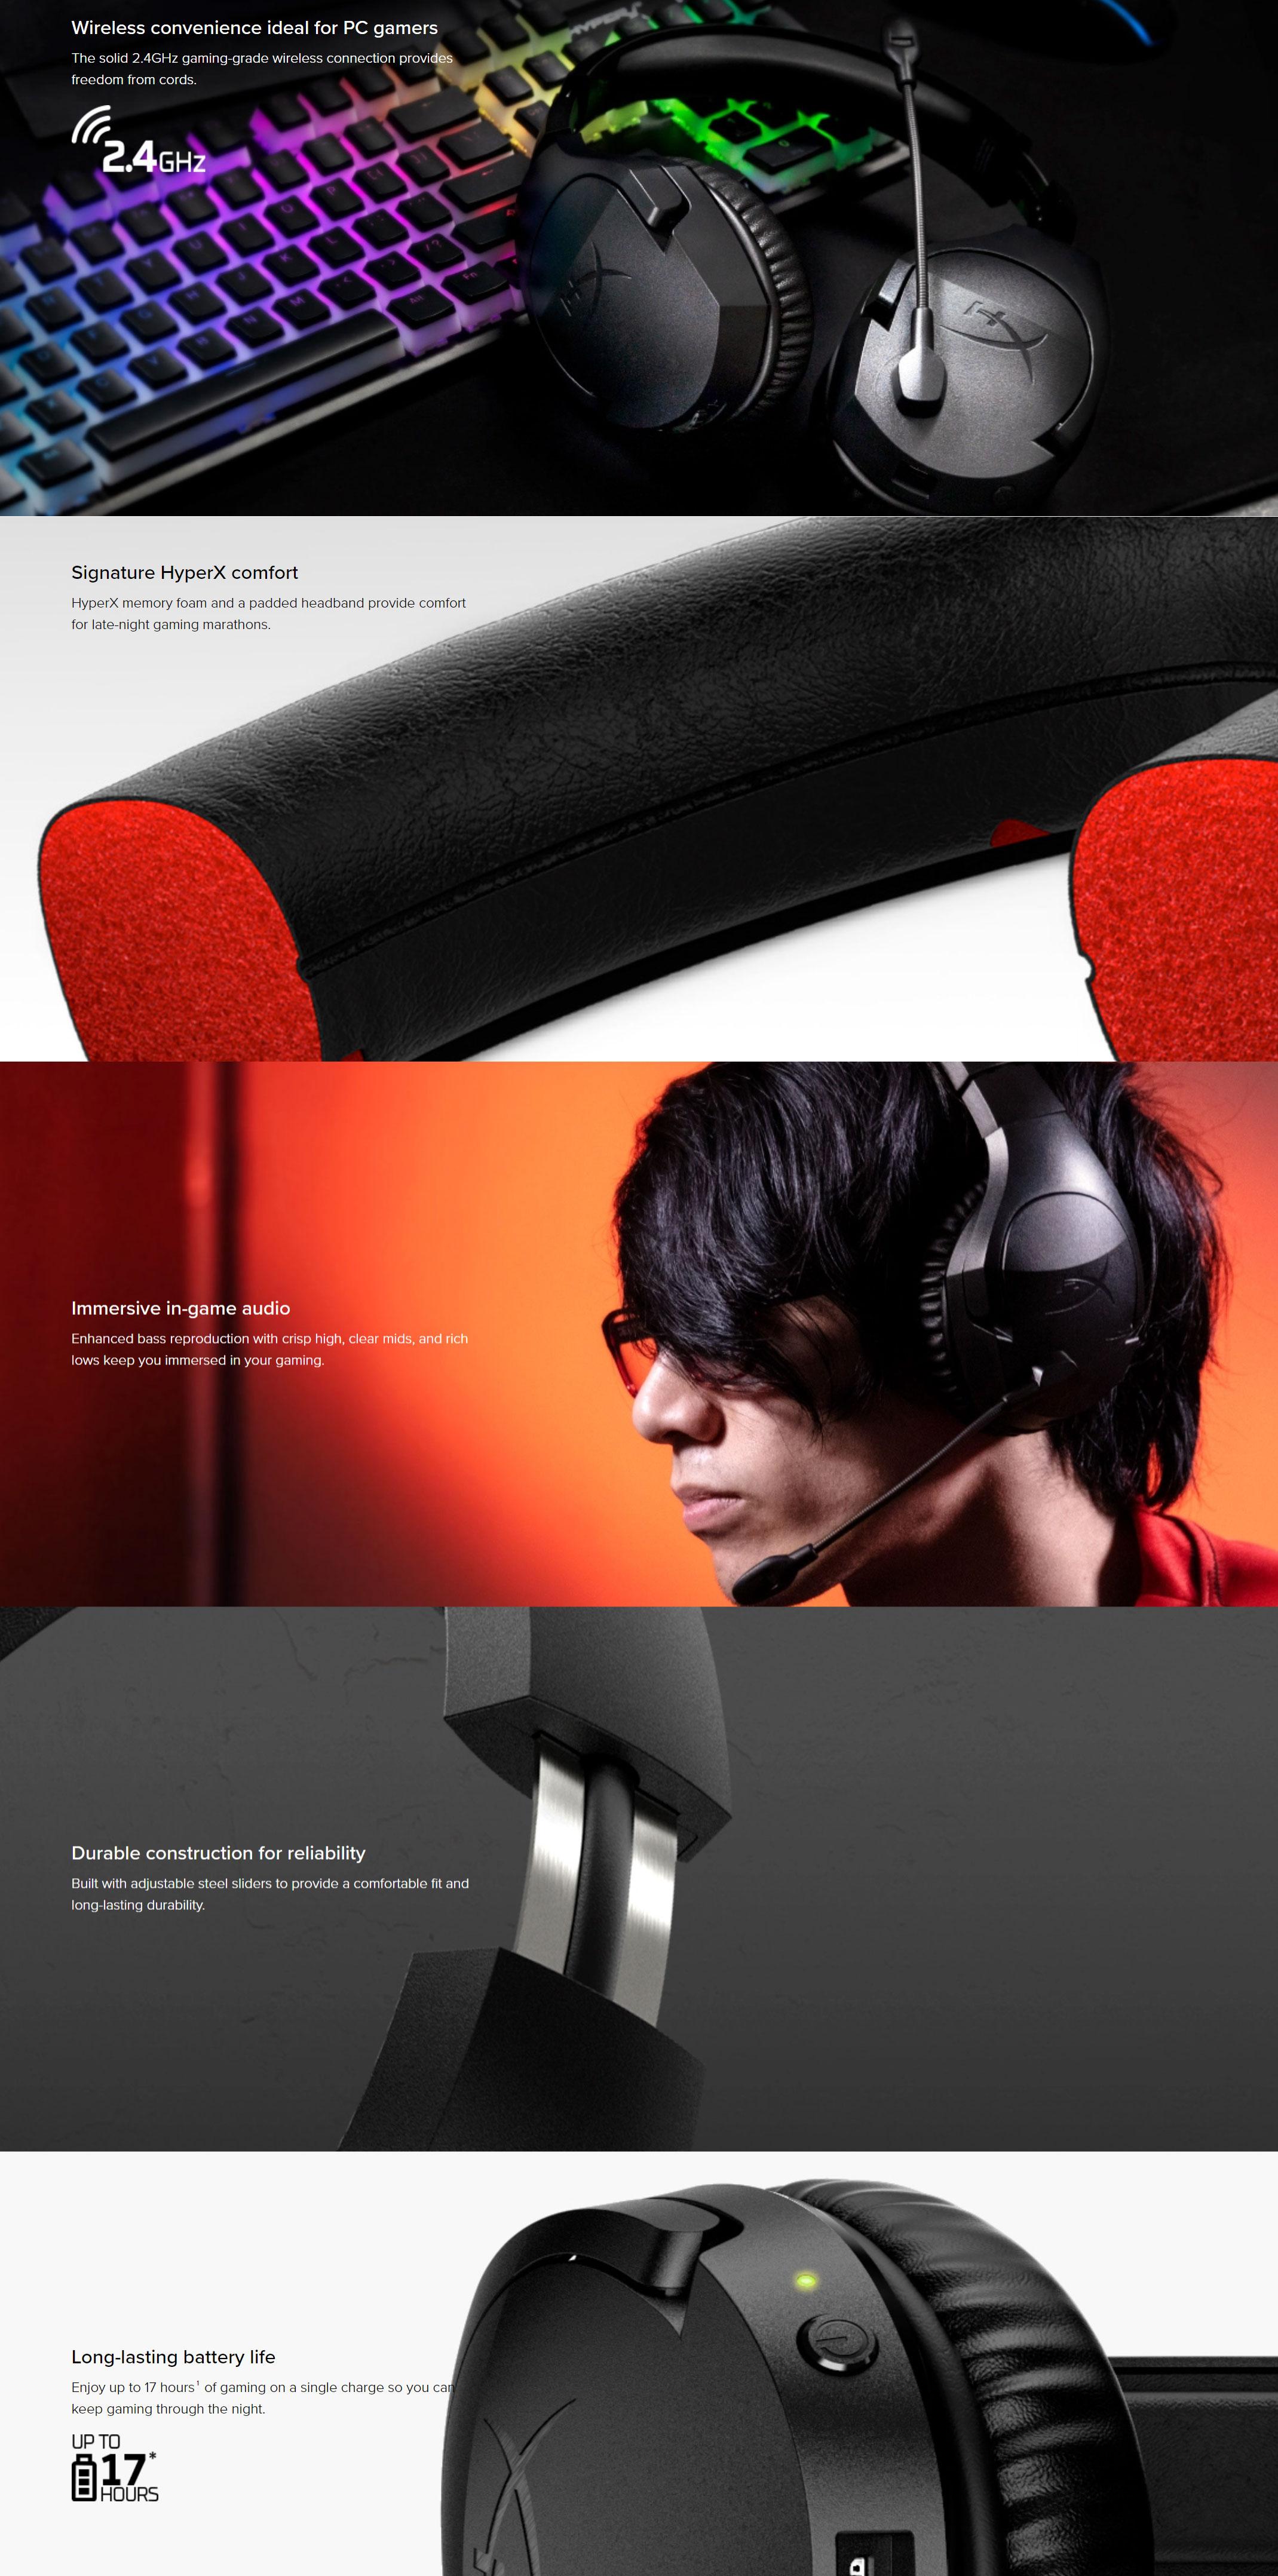 FireShot-Capture-003---Cloud-Stinger-–-USB-Wireless-Gaming-Headset-for-PC---HyperX_---www.jpg